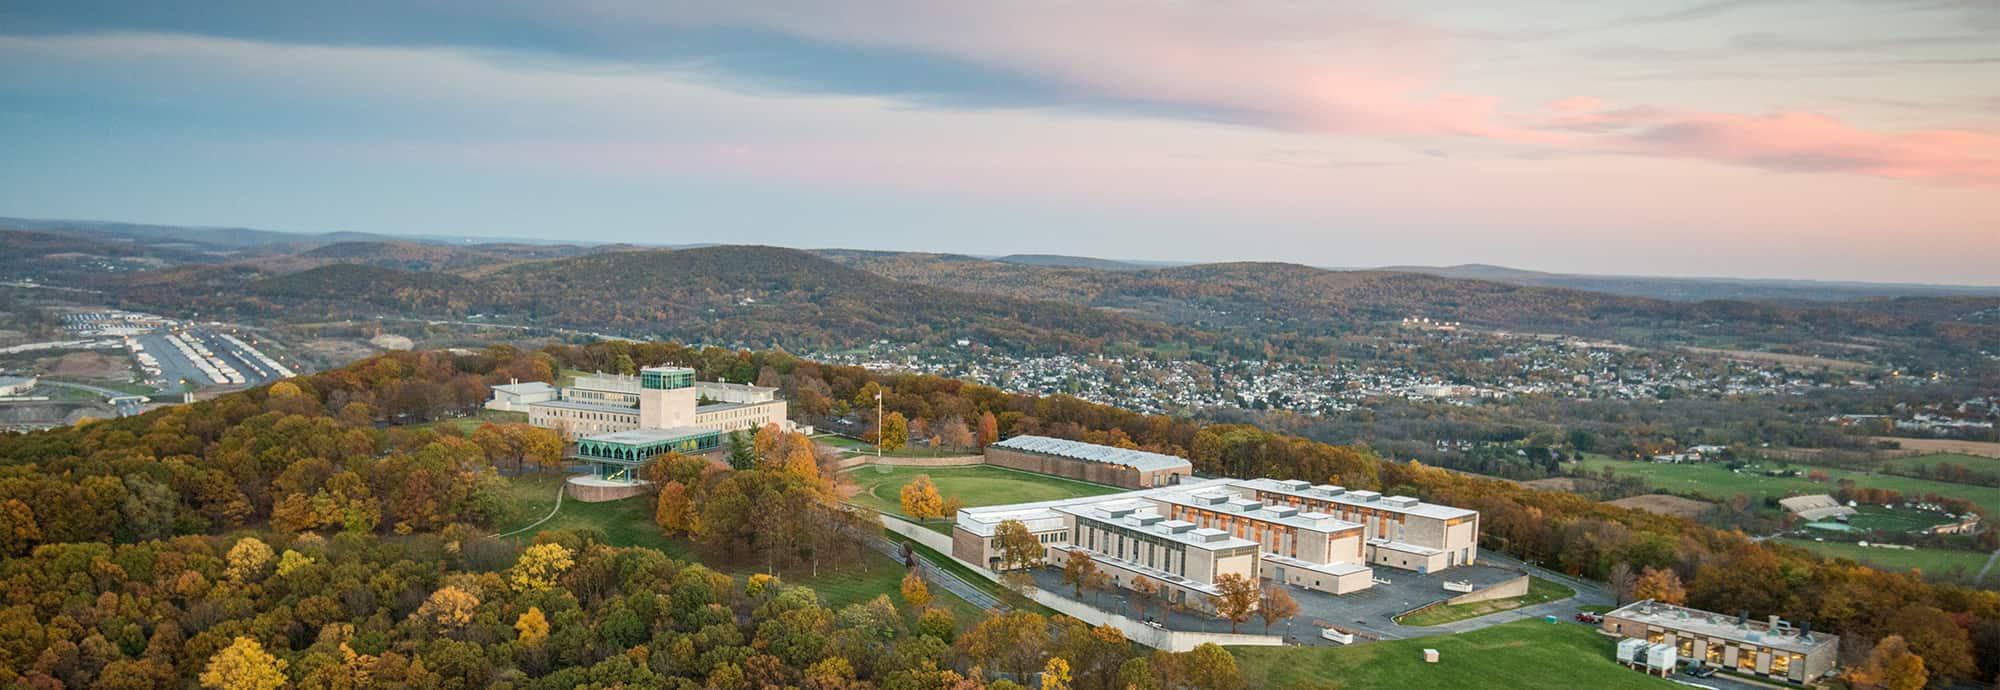 Mountaintop Campus